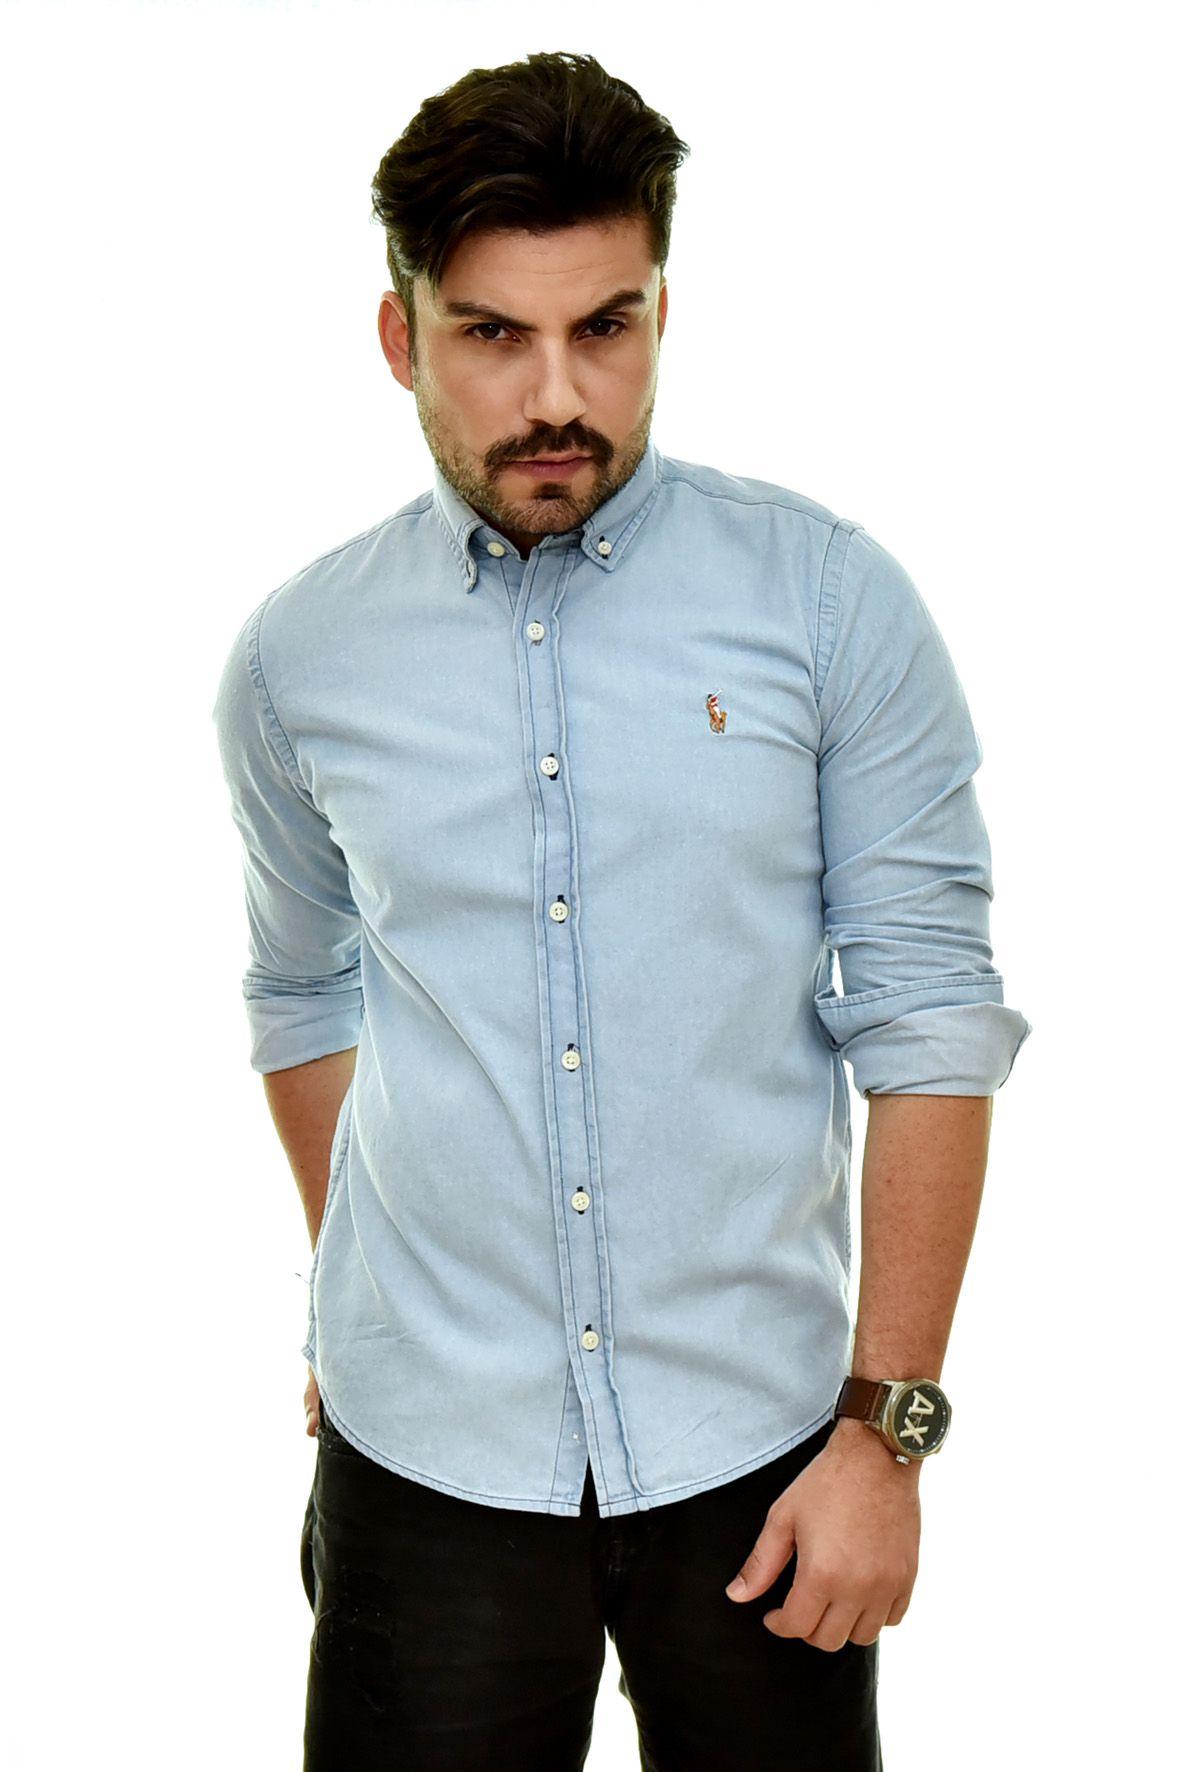 Camisa Jeans Azul Claro RL - Custom Fit  - Ca Brasileira